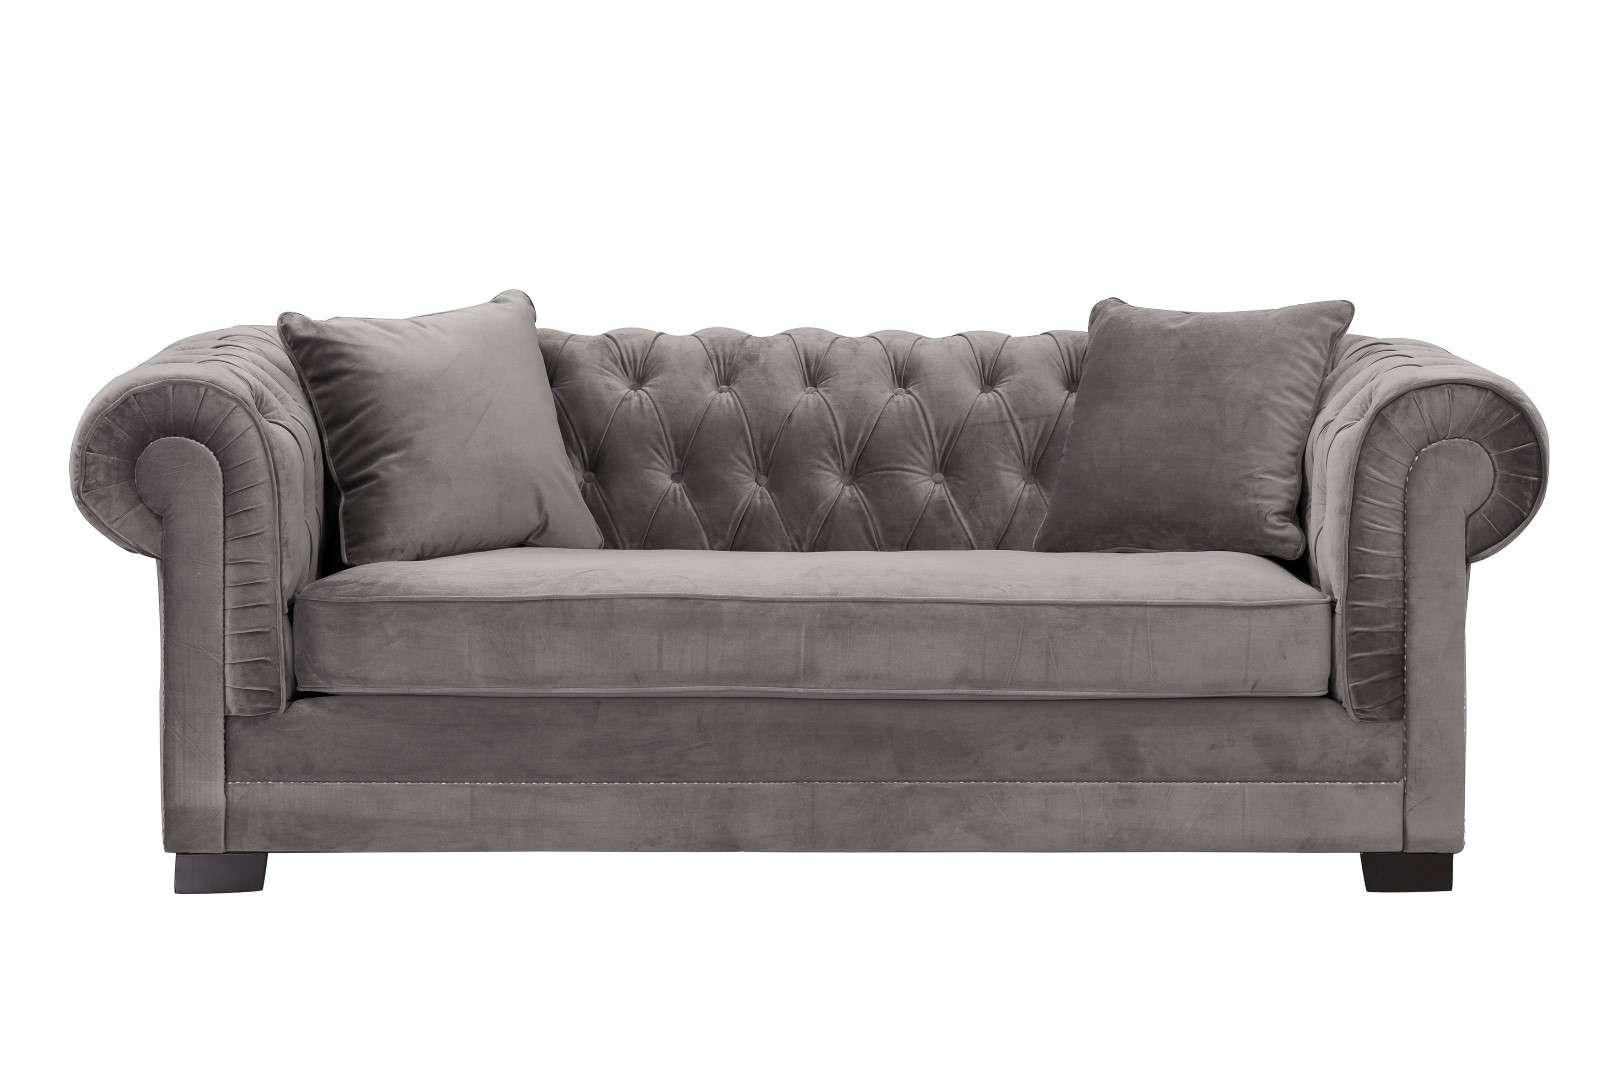 Sofa Chesterfield Classic Velvet Dark Grey 3-os.